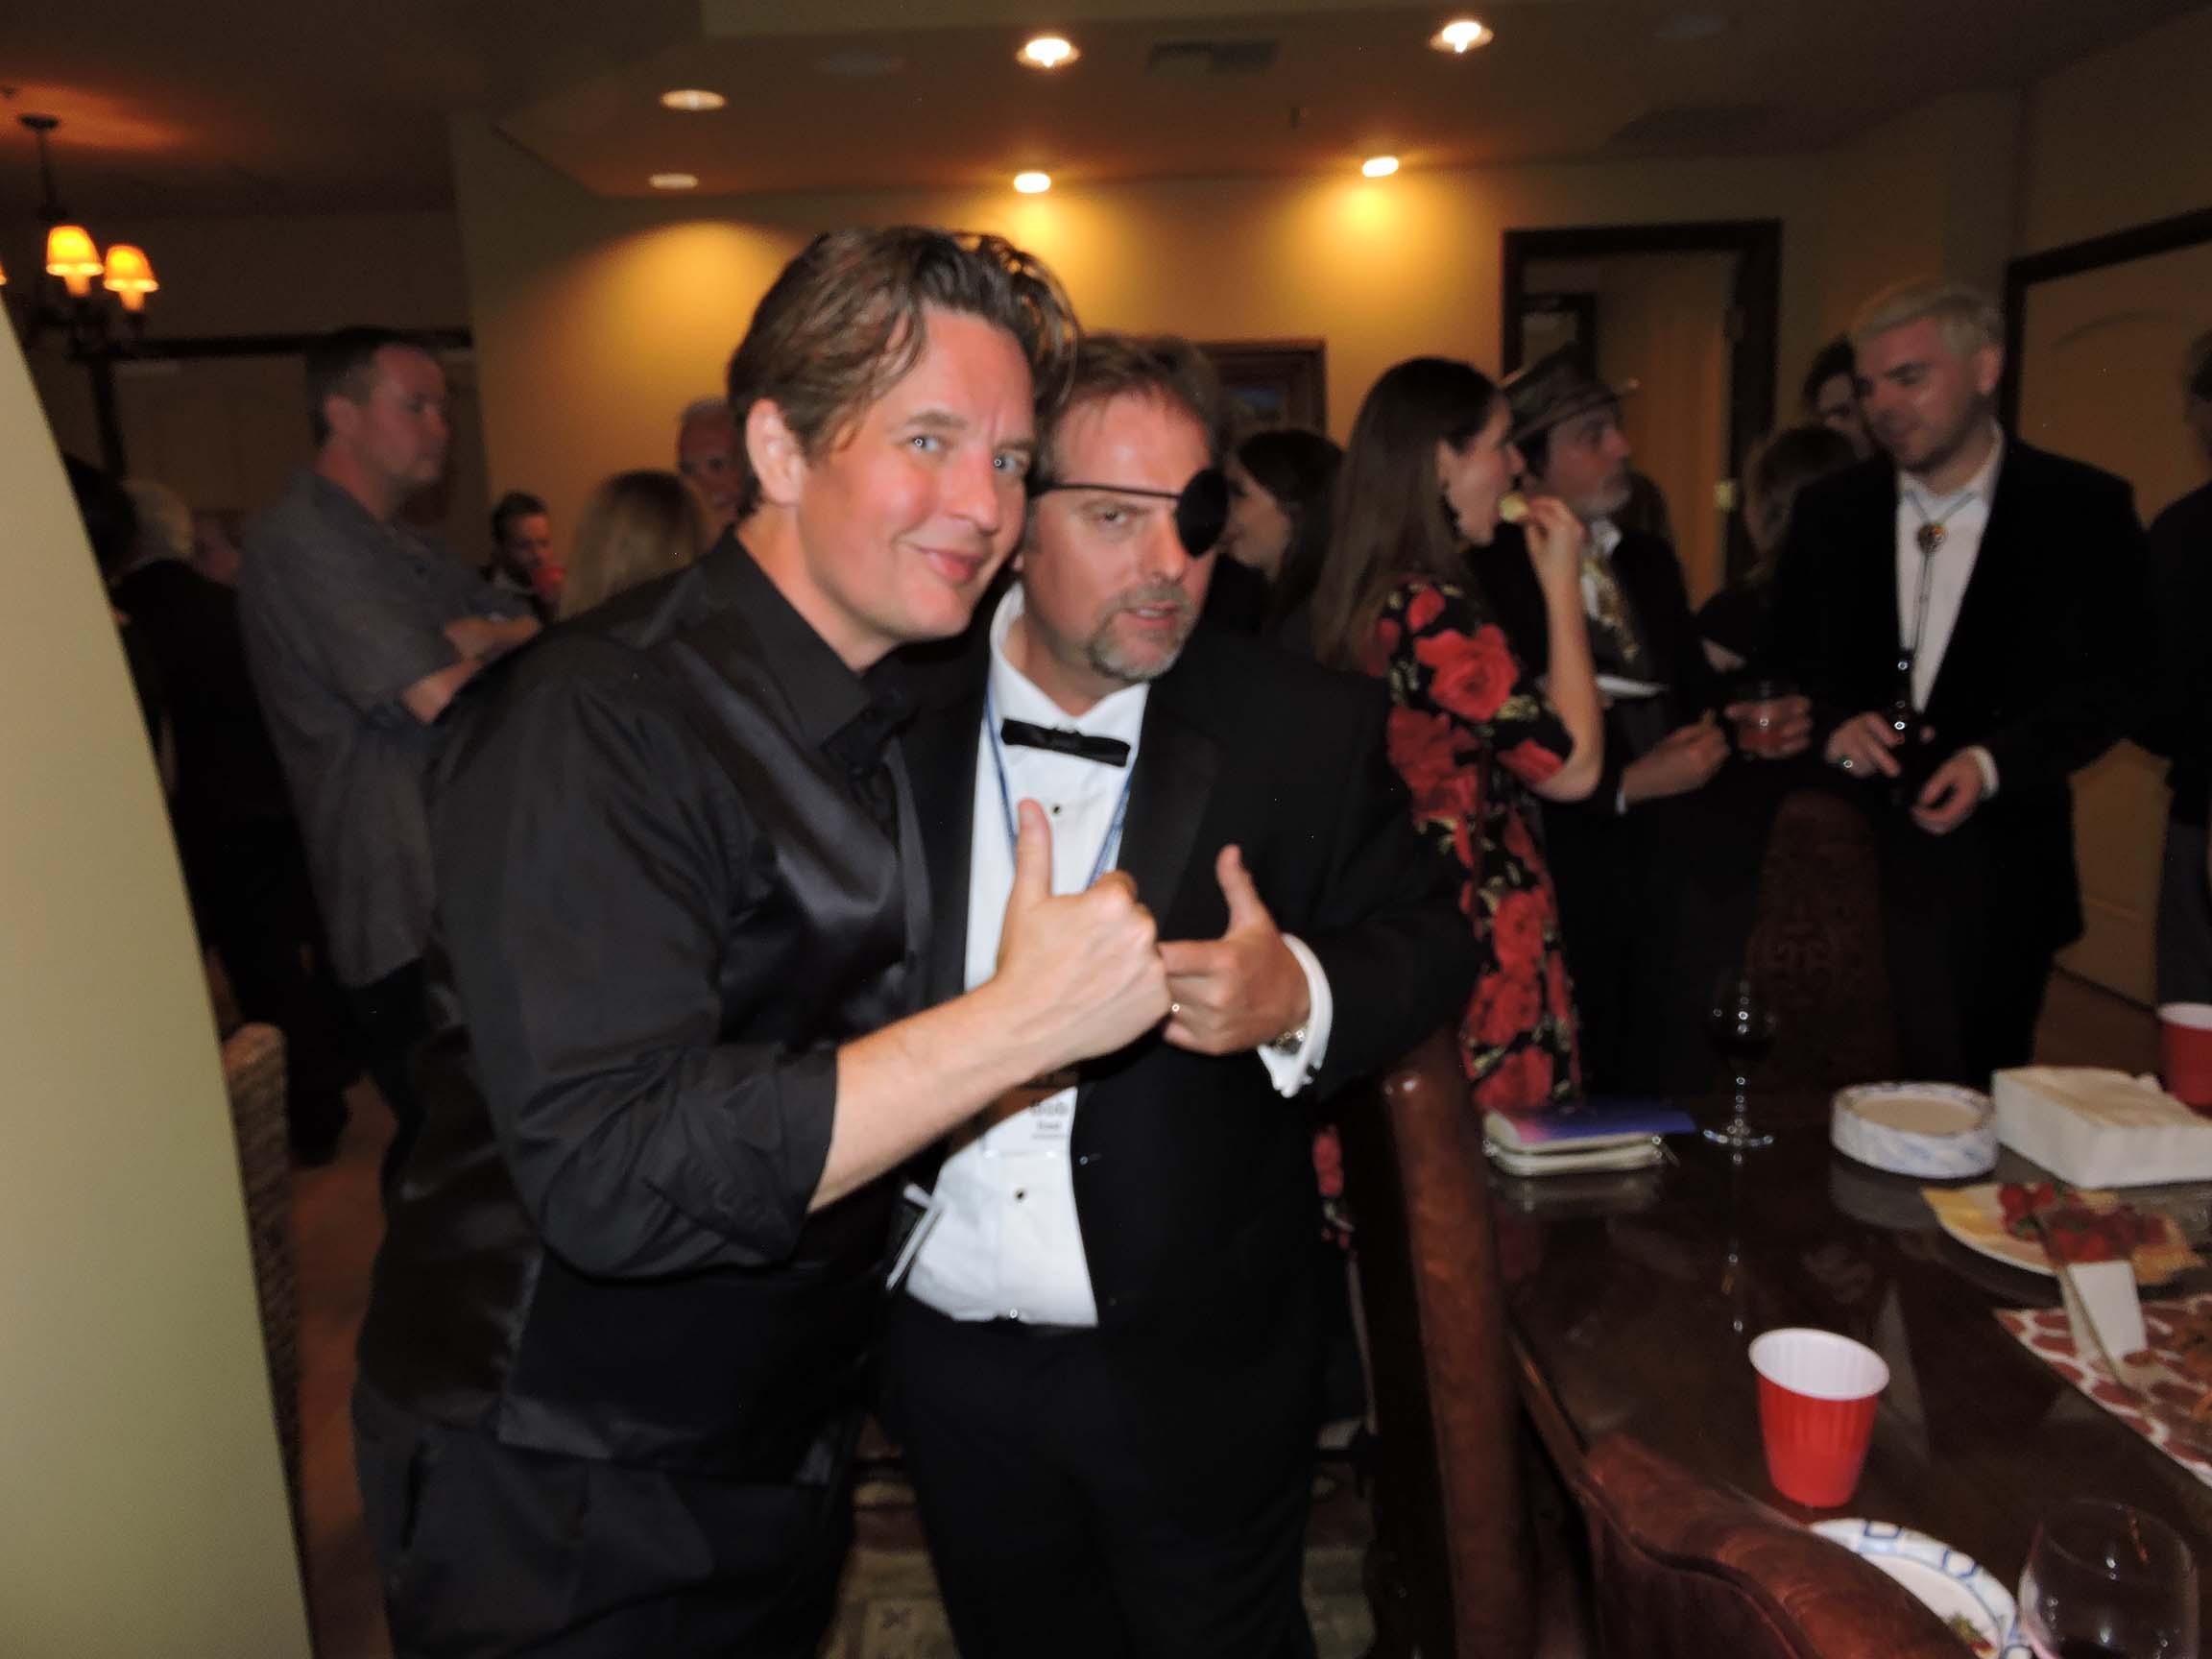 Keelan Parham (left) and Bob East